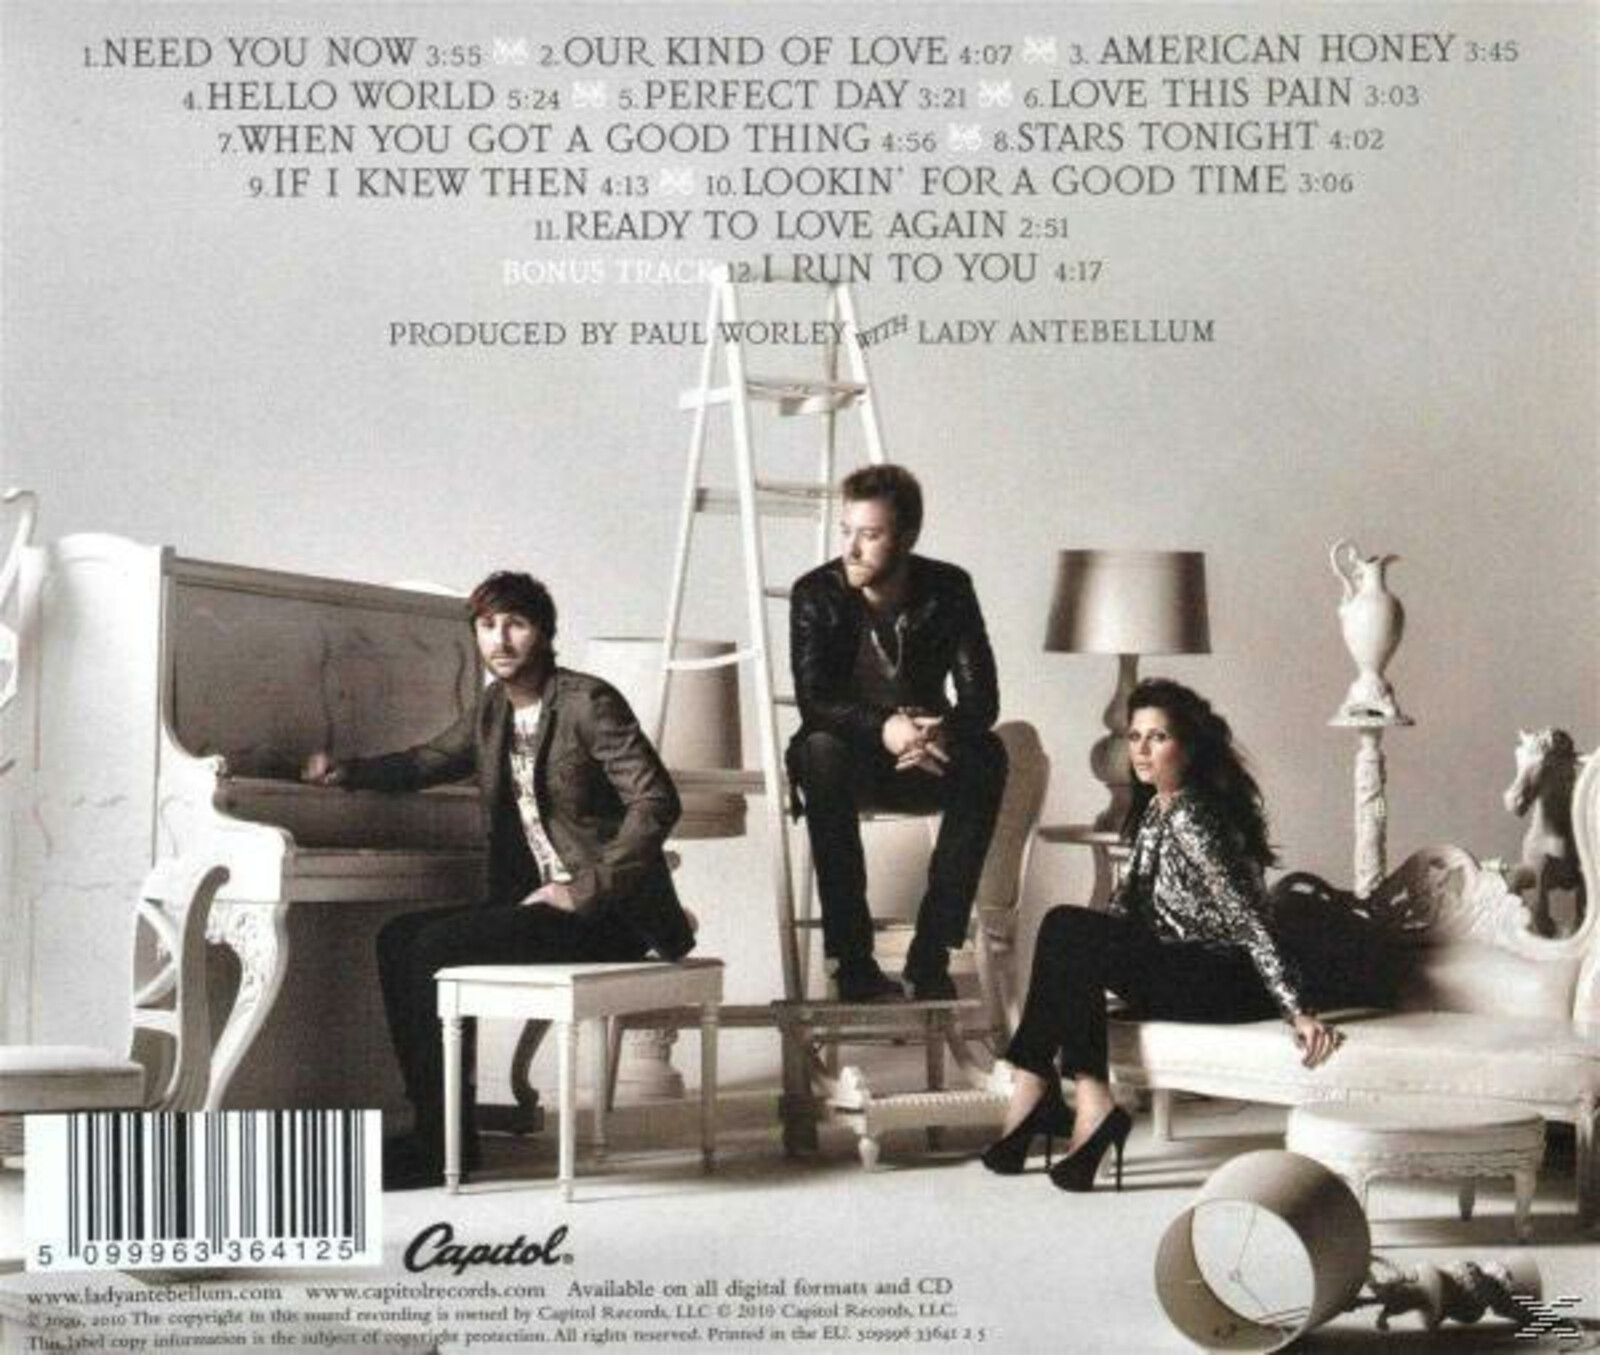 Lady Antebellum - Lady Antebellum - Need You Now [CD] 7